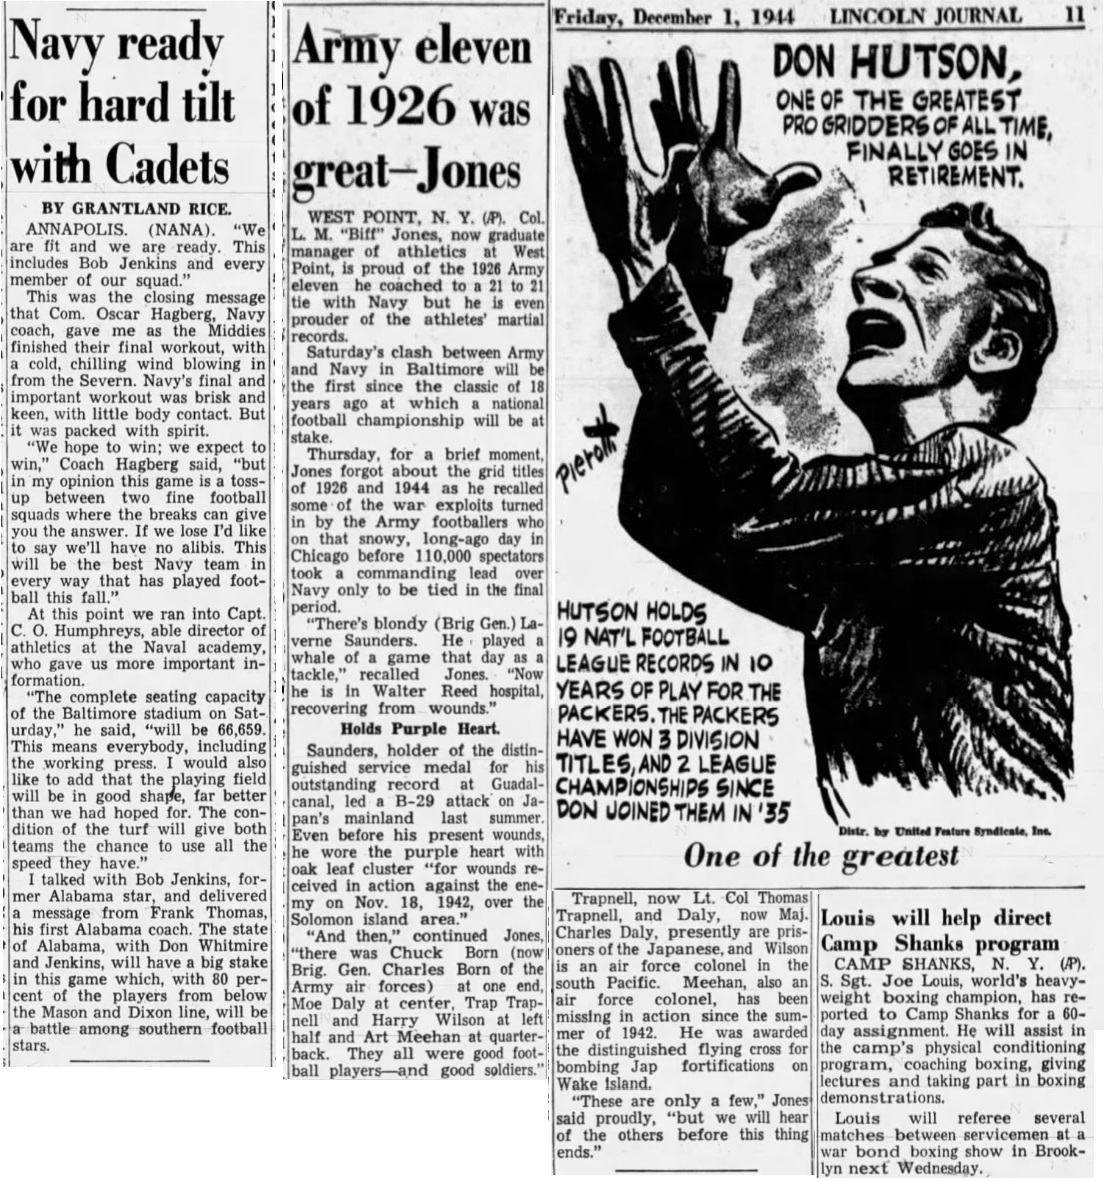 1944_DonHutson_byPierotti_ArmyFB-BiffJones_NEState-LincolnJournal_Dec11944